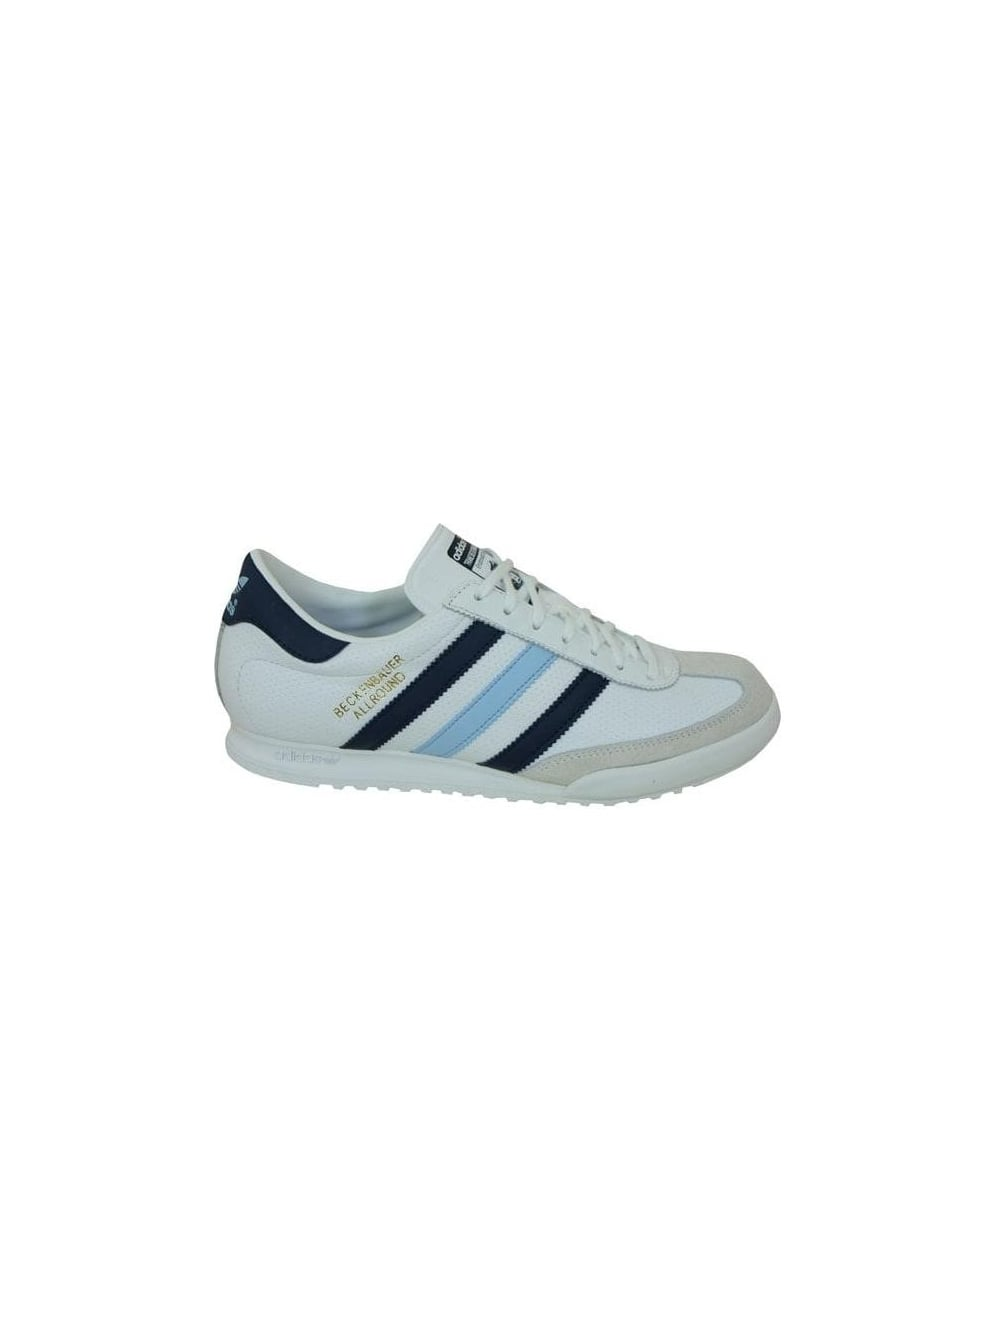 1d68f9ad84e Adidas Originals Beckenbauer Trainers in White Navy - Northern Threads